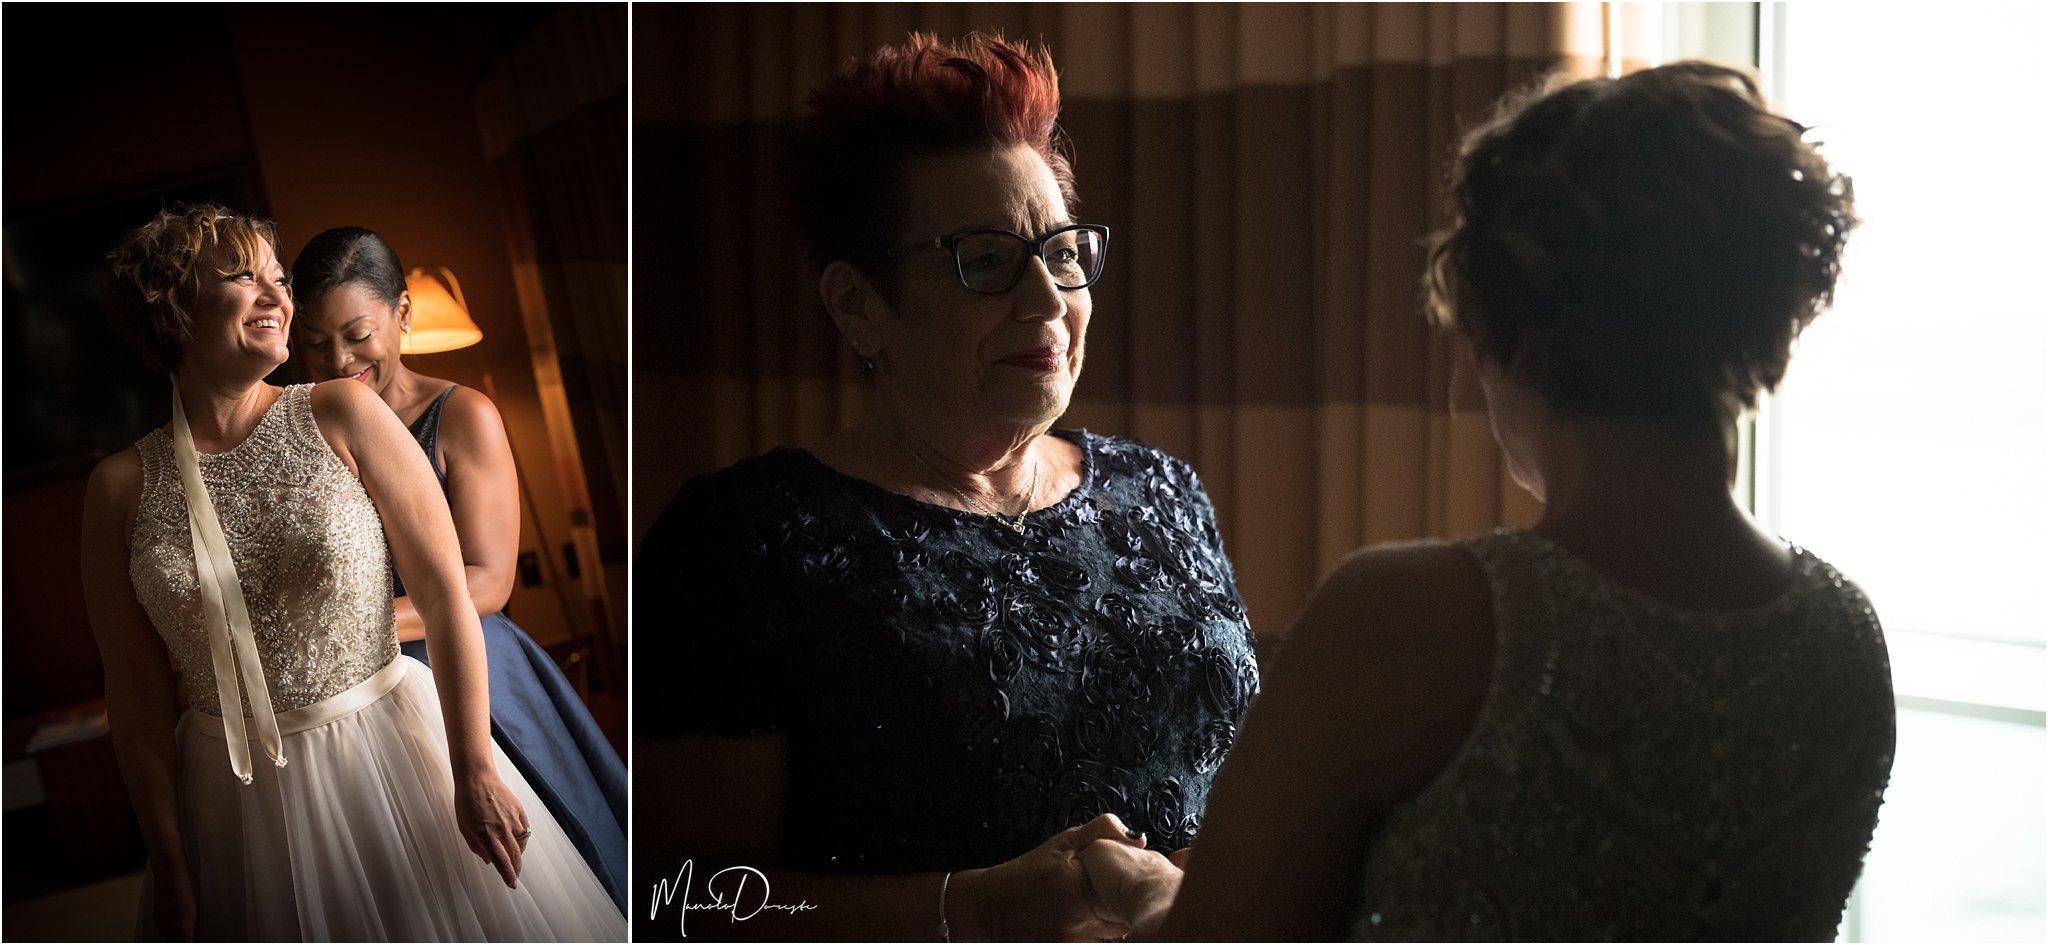 0438_ManoloDoreste_InFocusStudios_Wedding_Family_Photography_Miami_MiamiPhotographer.jpg